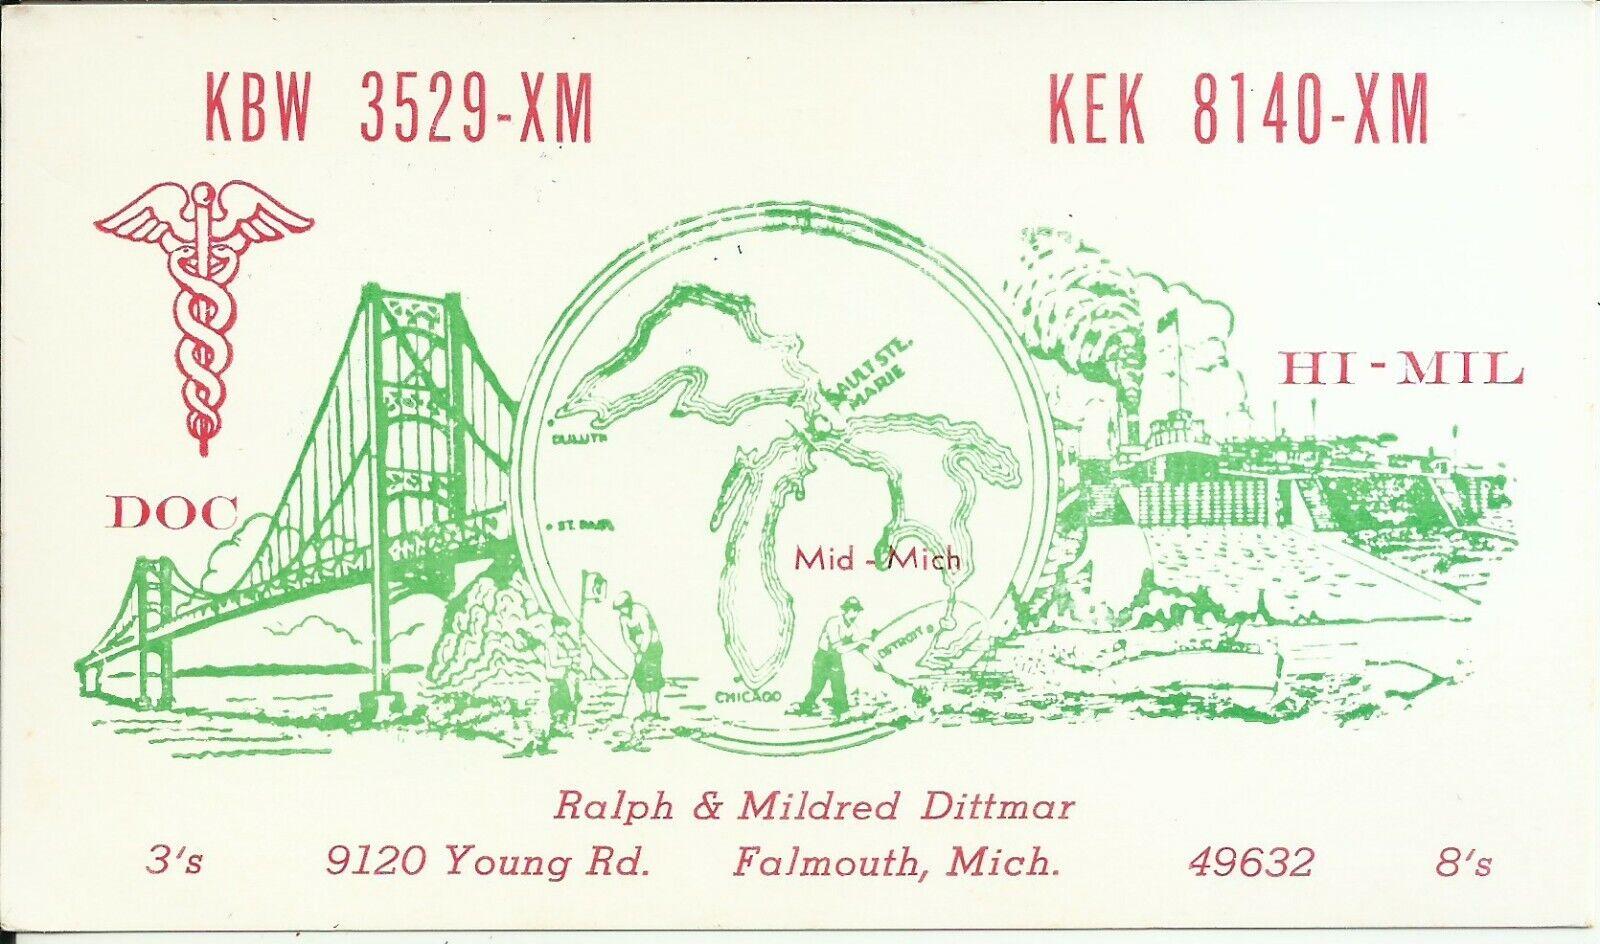 Vintage KBW-3529-XM Falmouth Michigan USA CB Radio QSL Card